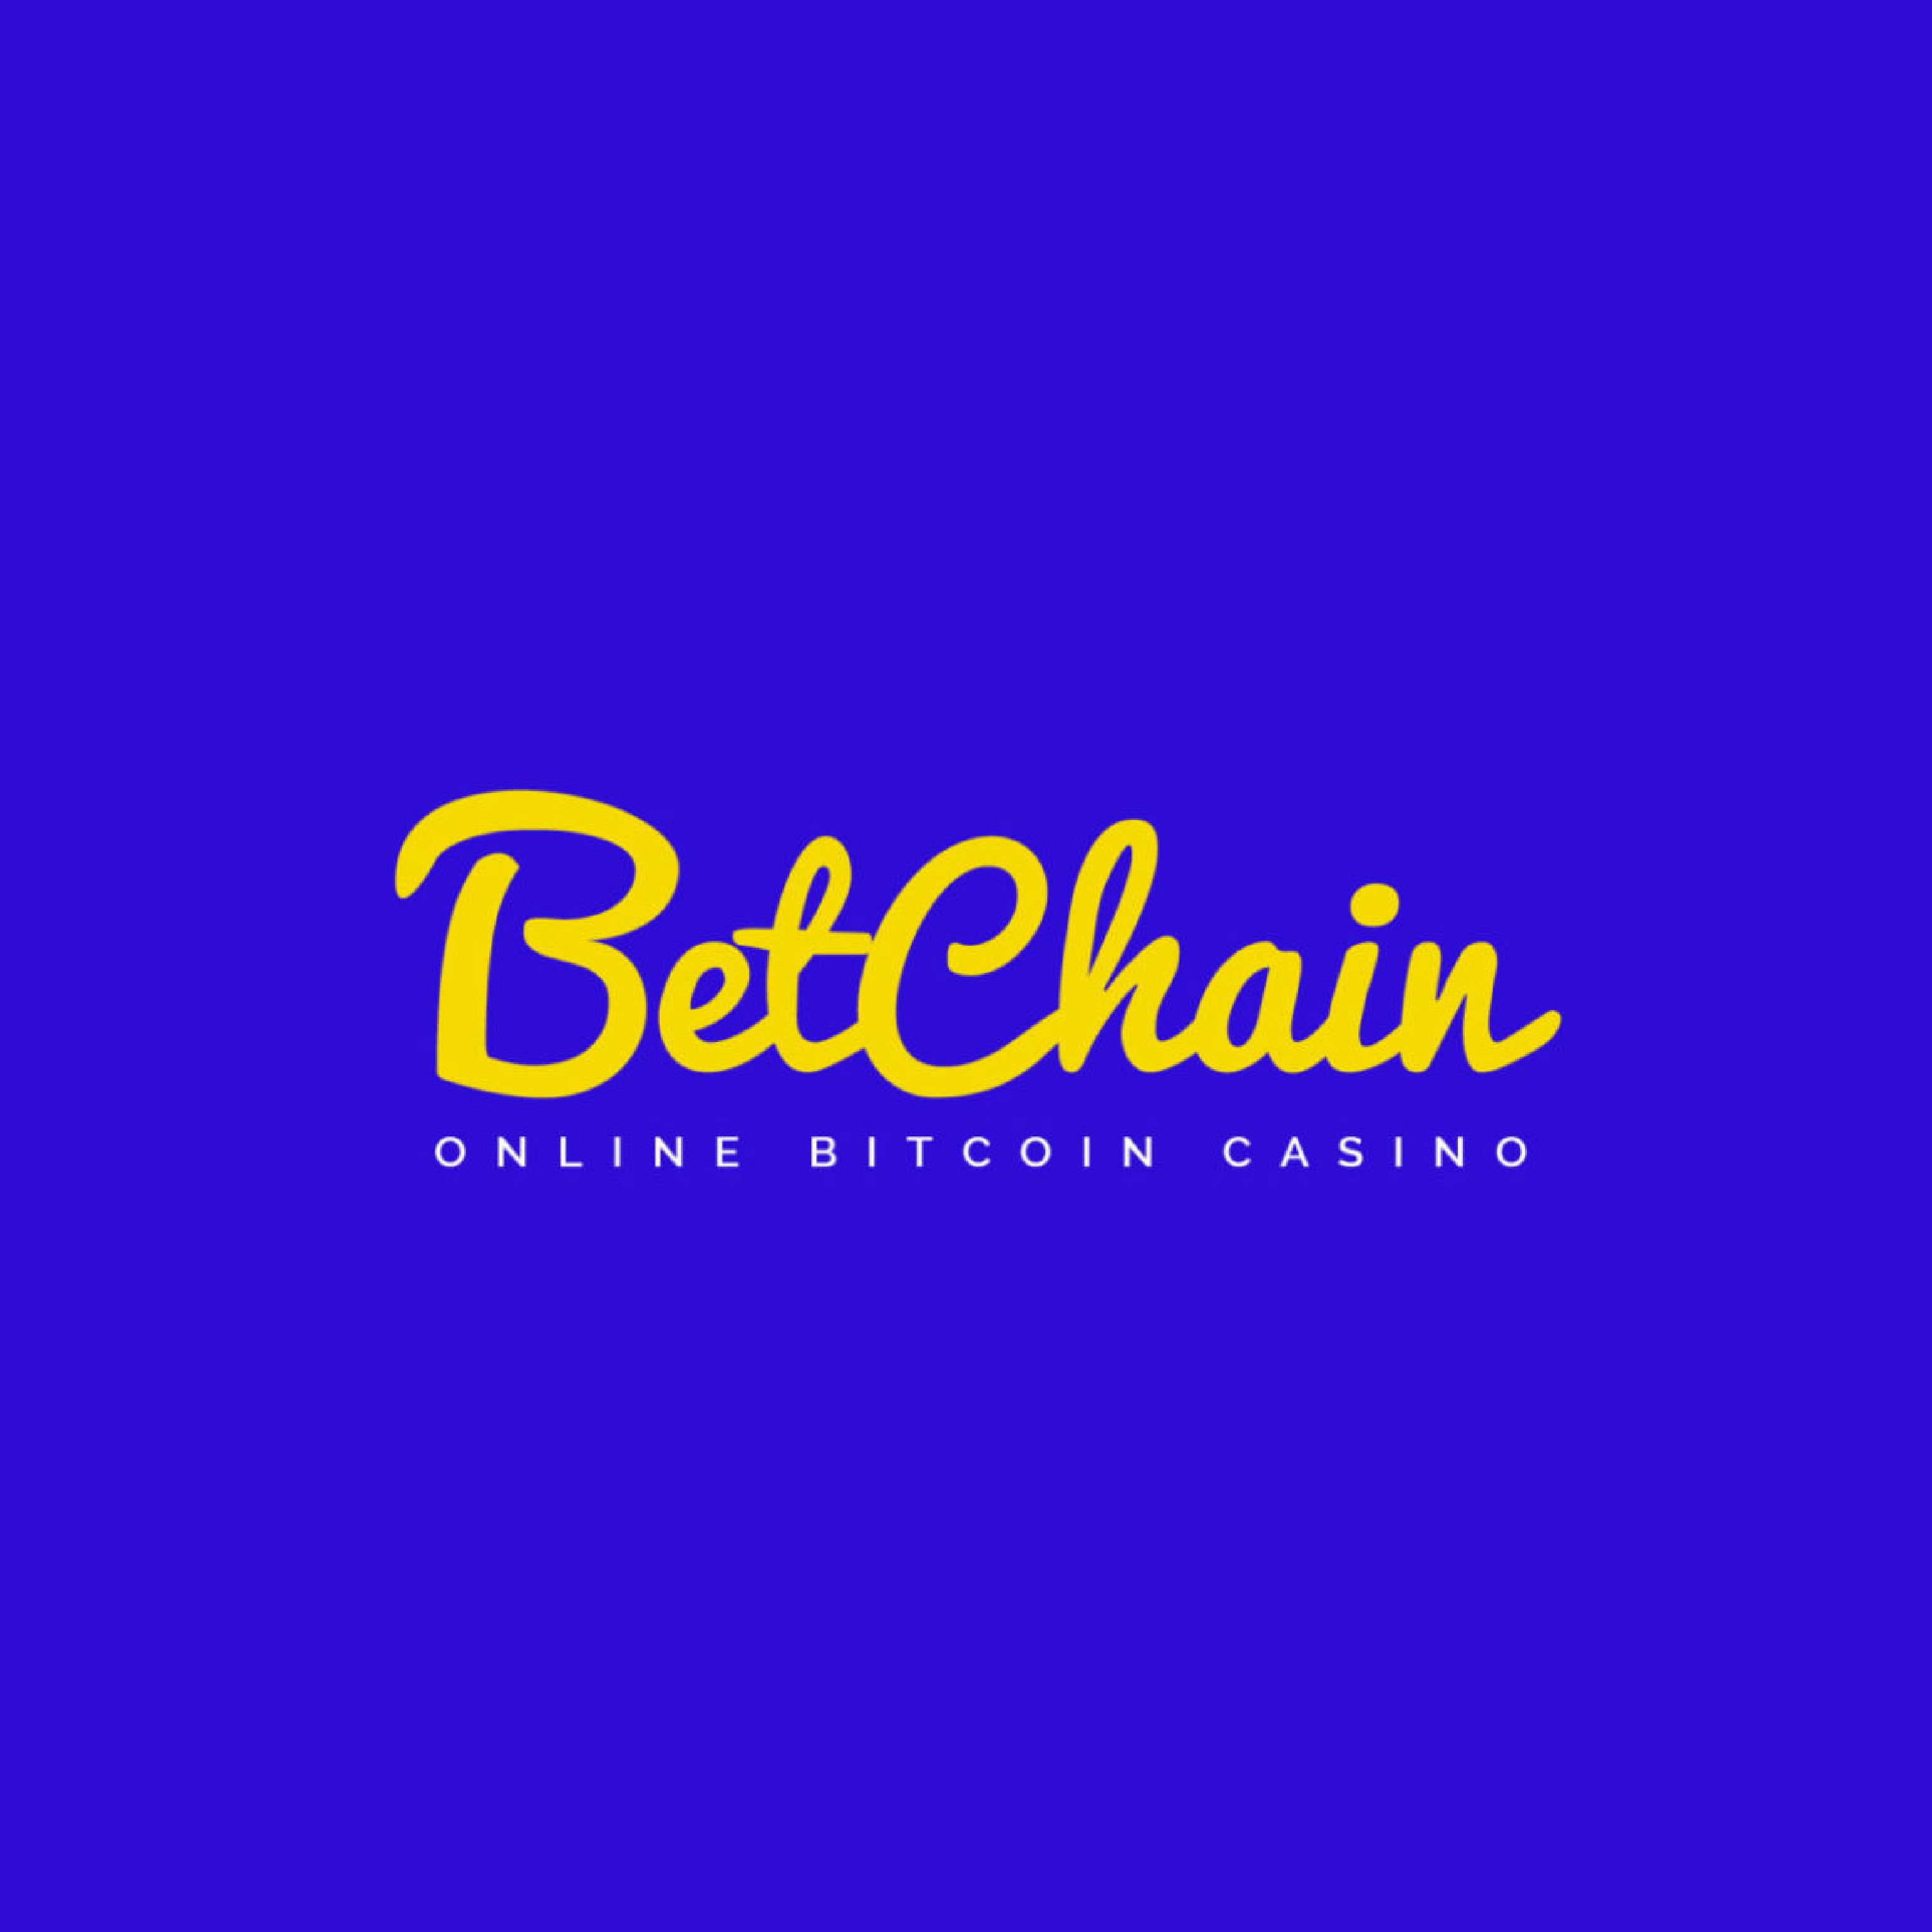 Bitcoin casino on my phone